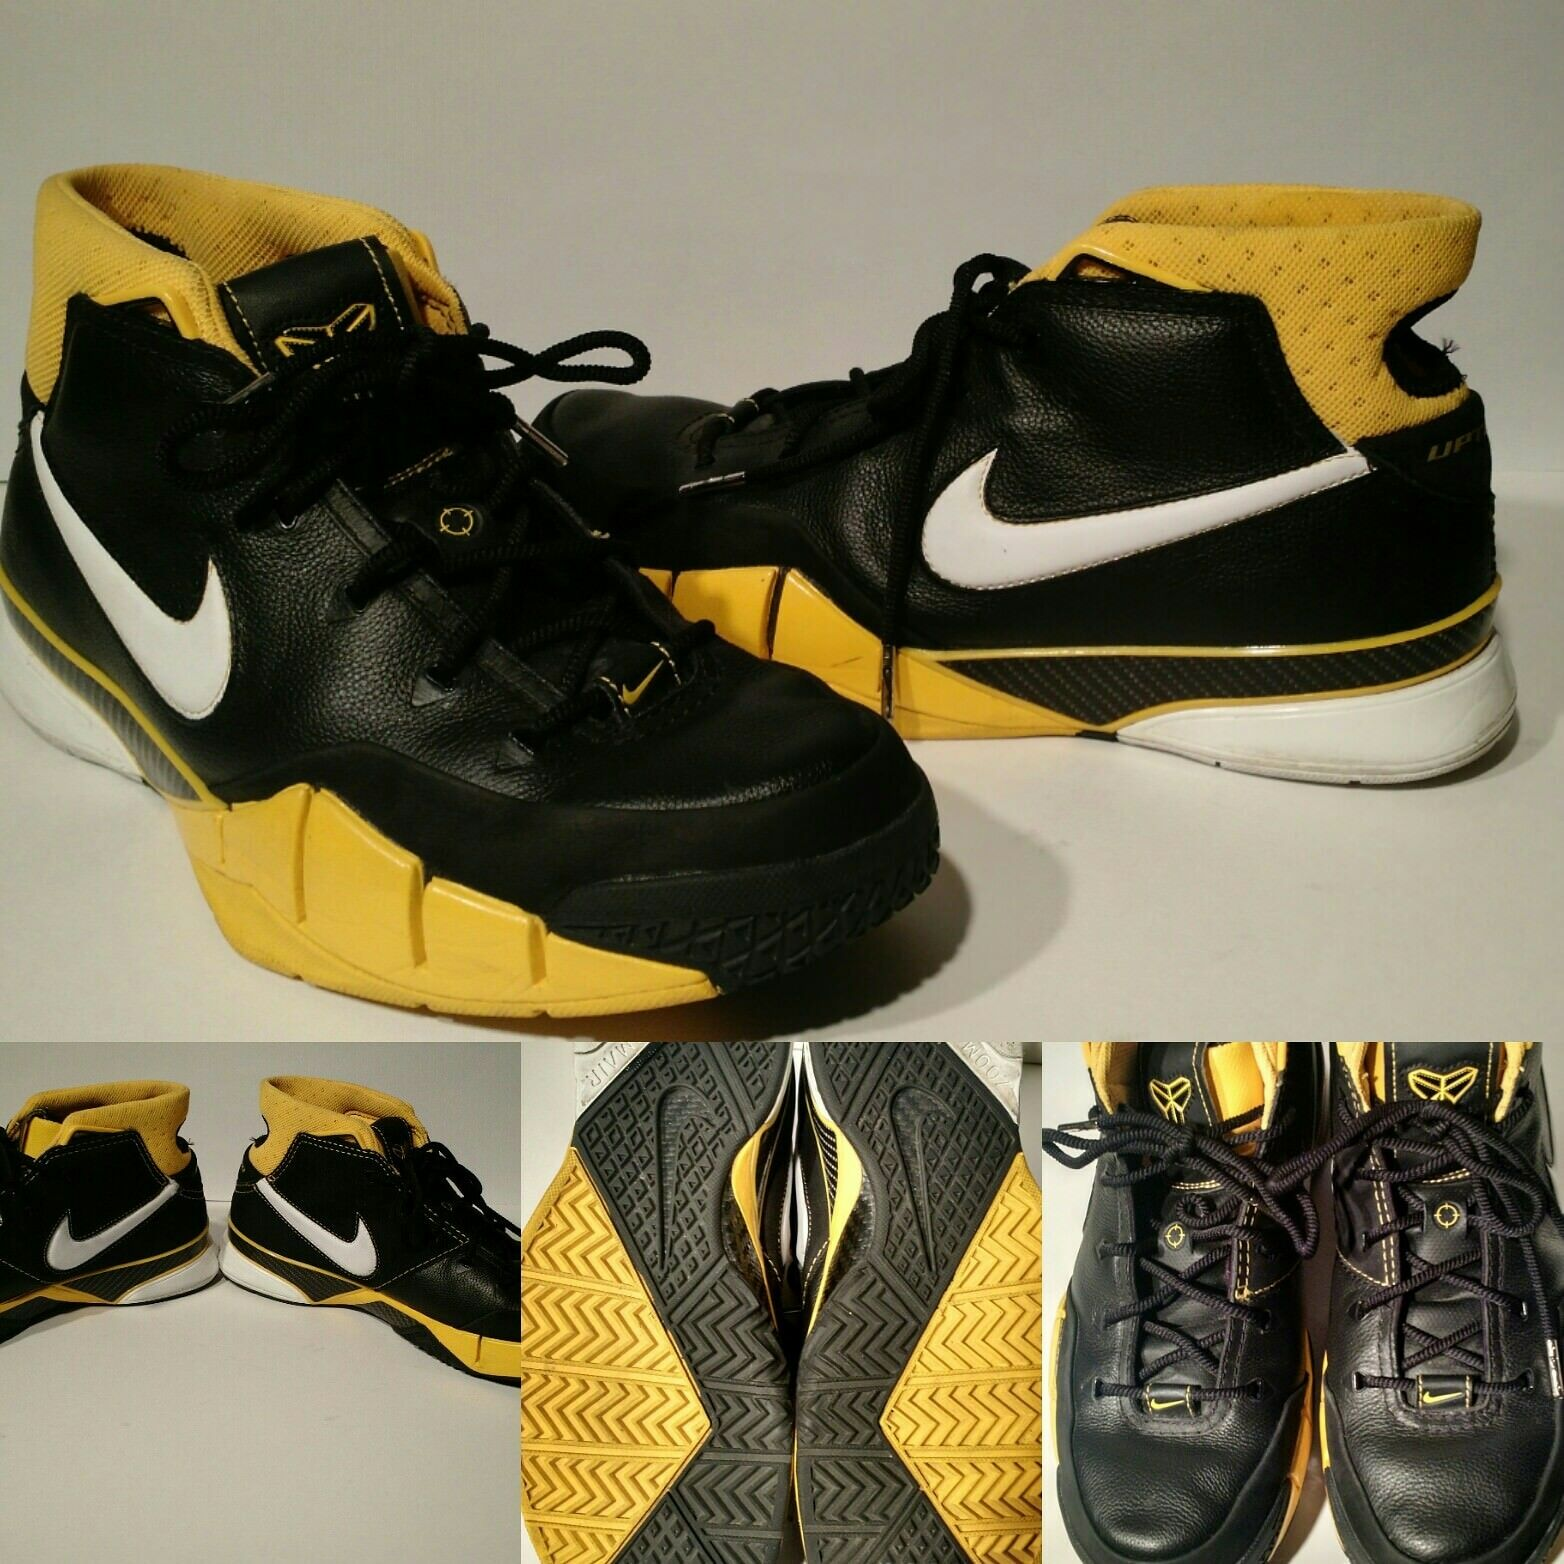 Kobe Kobe Kobe Bryant 1 (Del Sol) SZ 10 2006 OG Uptempo Lakers Mamba 0a6e30